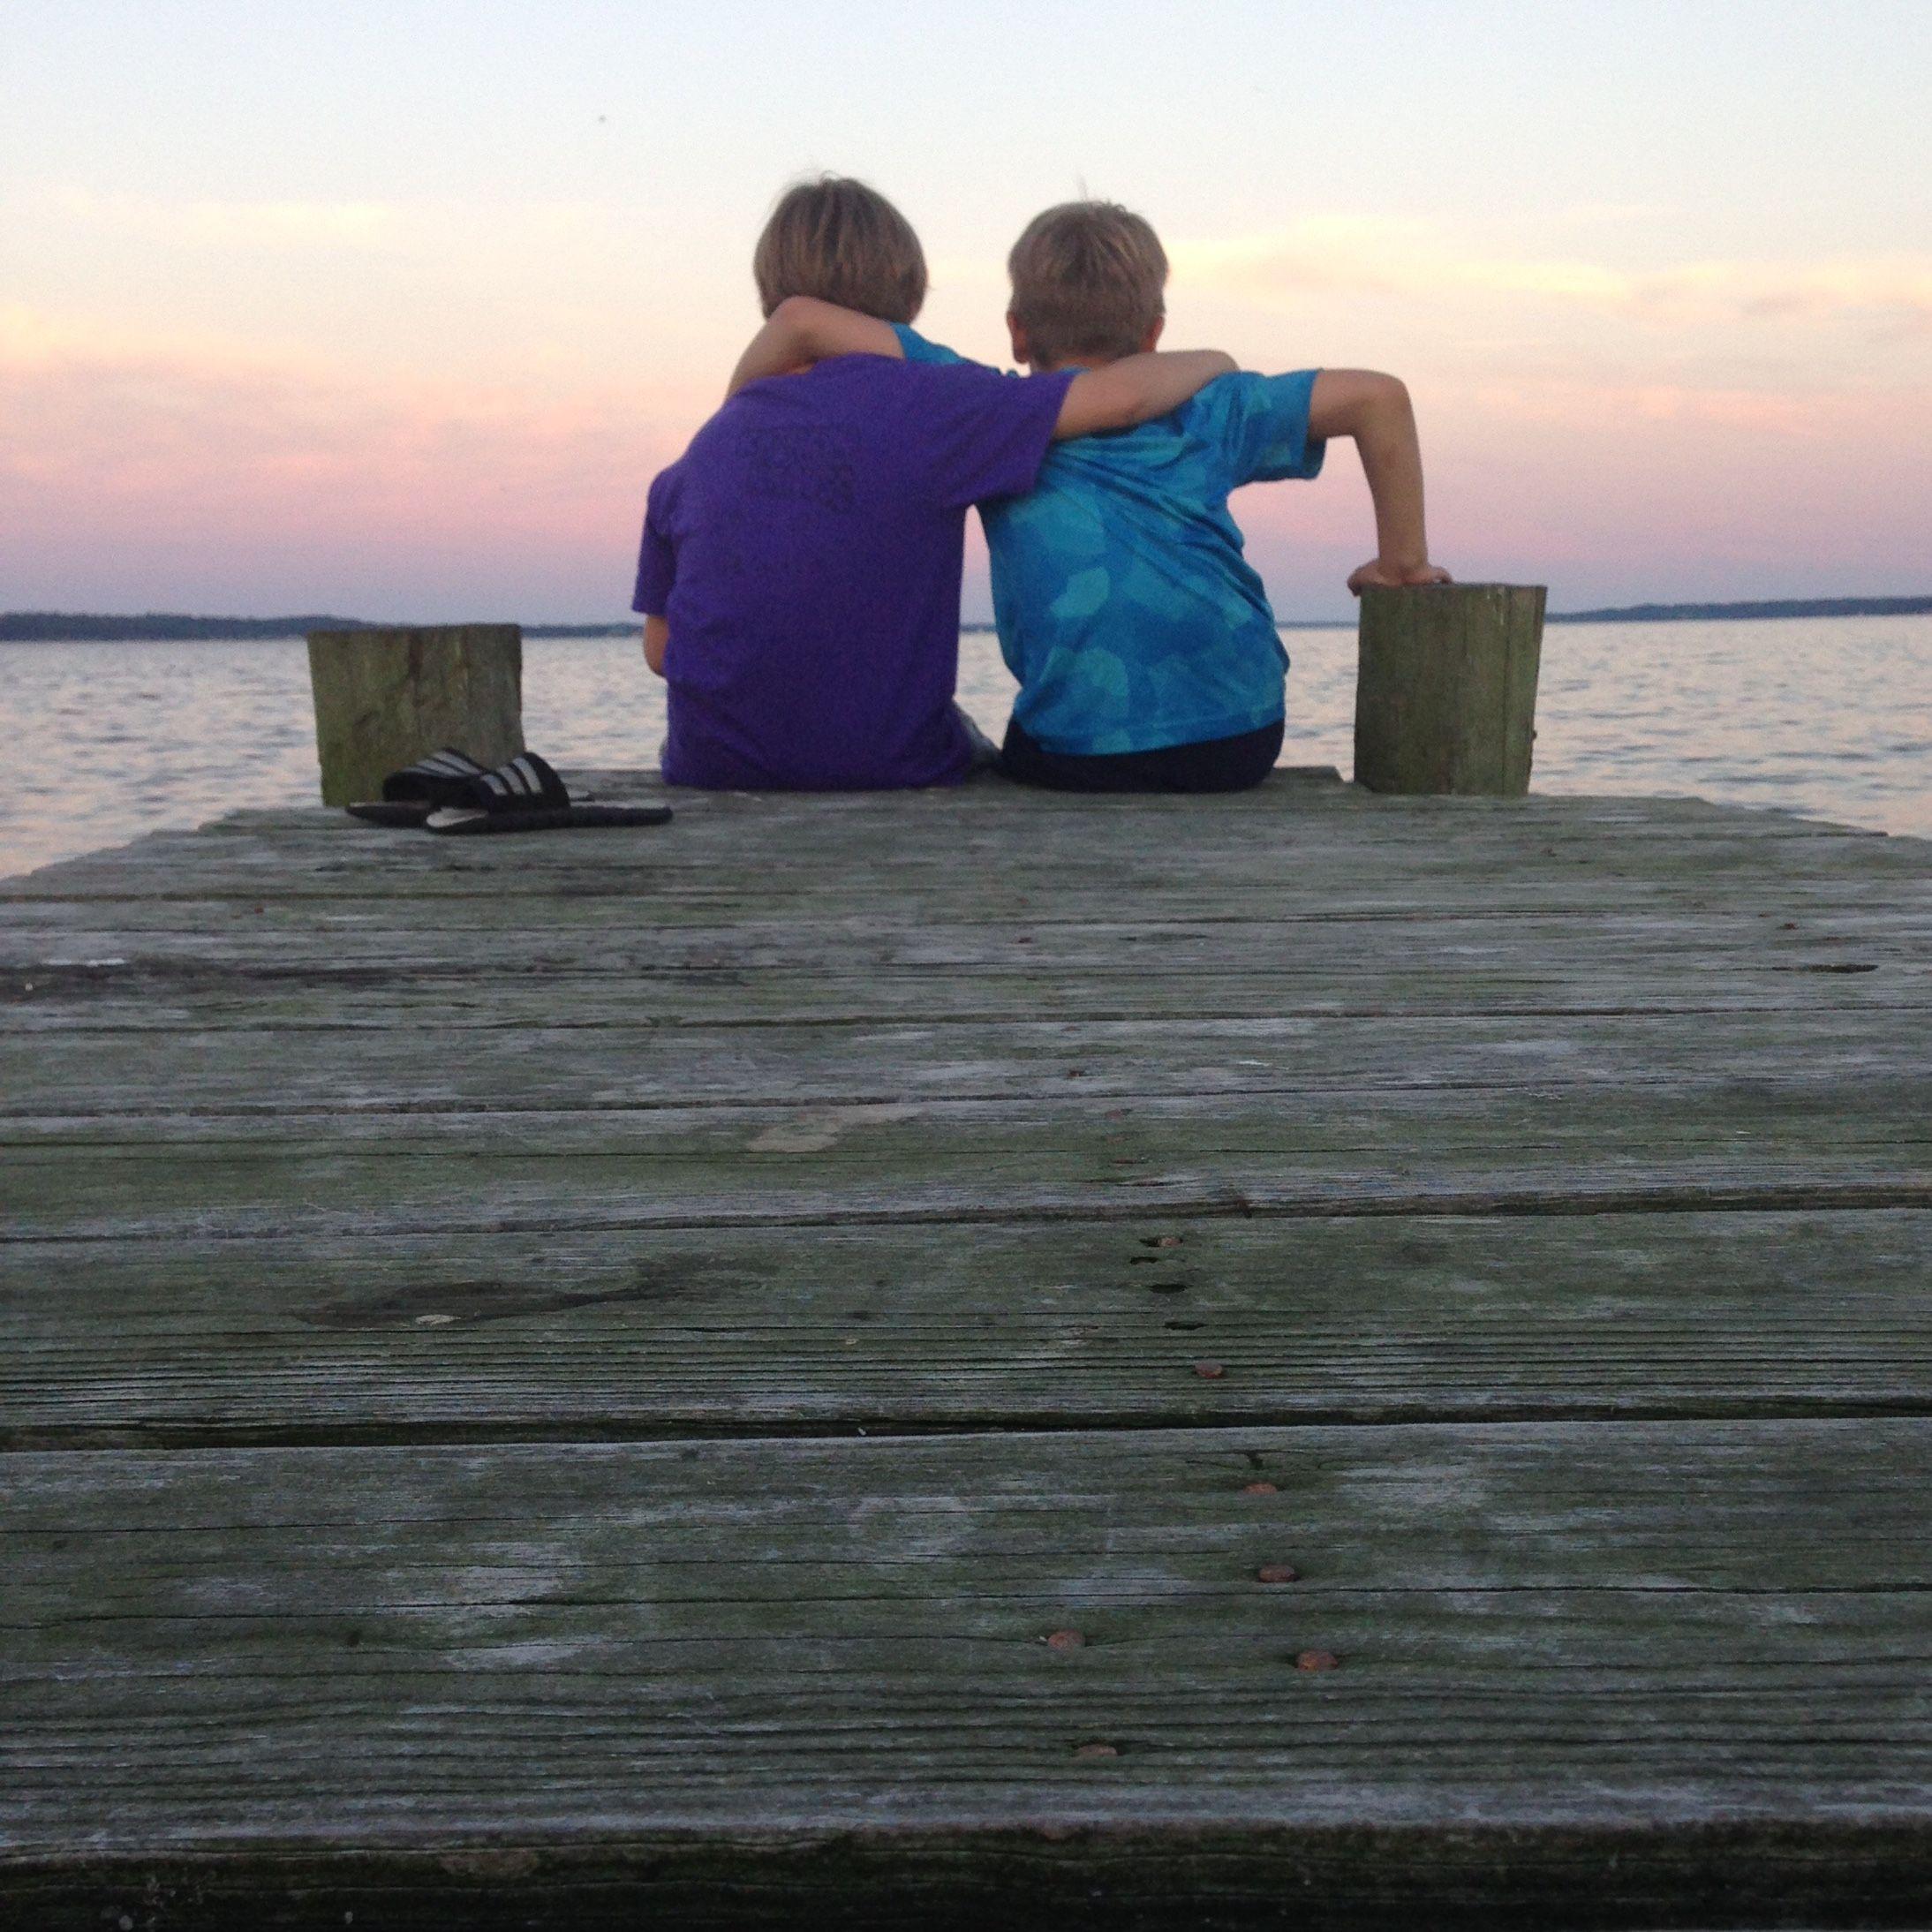 Brothers hug. Chesapeake Bay